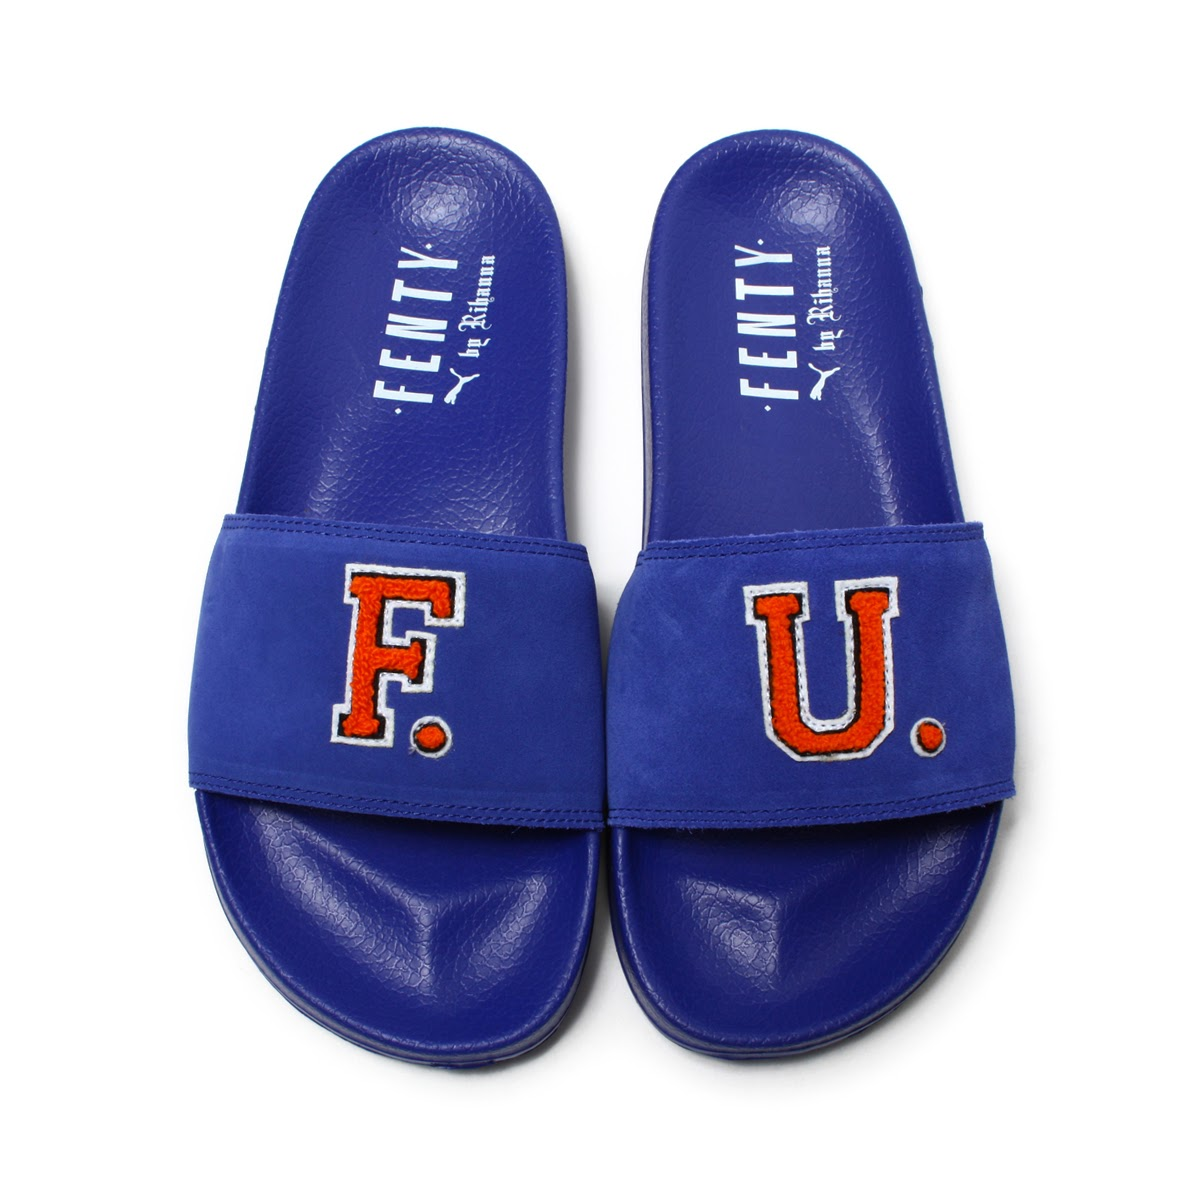 PUMA LEADCAT FENTY FU(CLEMATIS BLUE-SCARLET IBIS)(プーマ リードキャット フェンティ FU)【レディース】【スポーツサンダル】【リアーナ】【17HO-I】